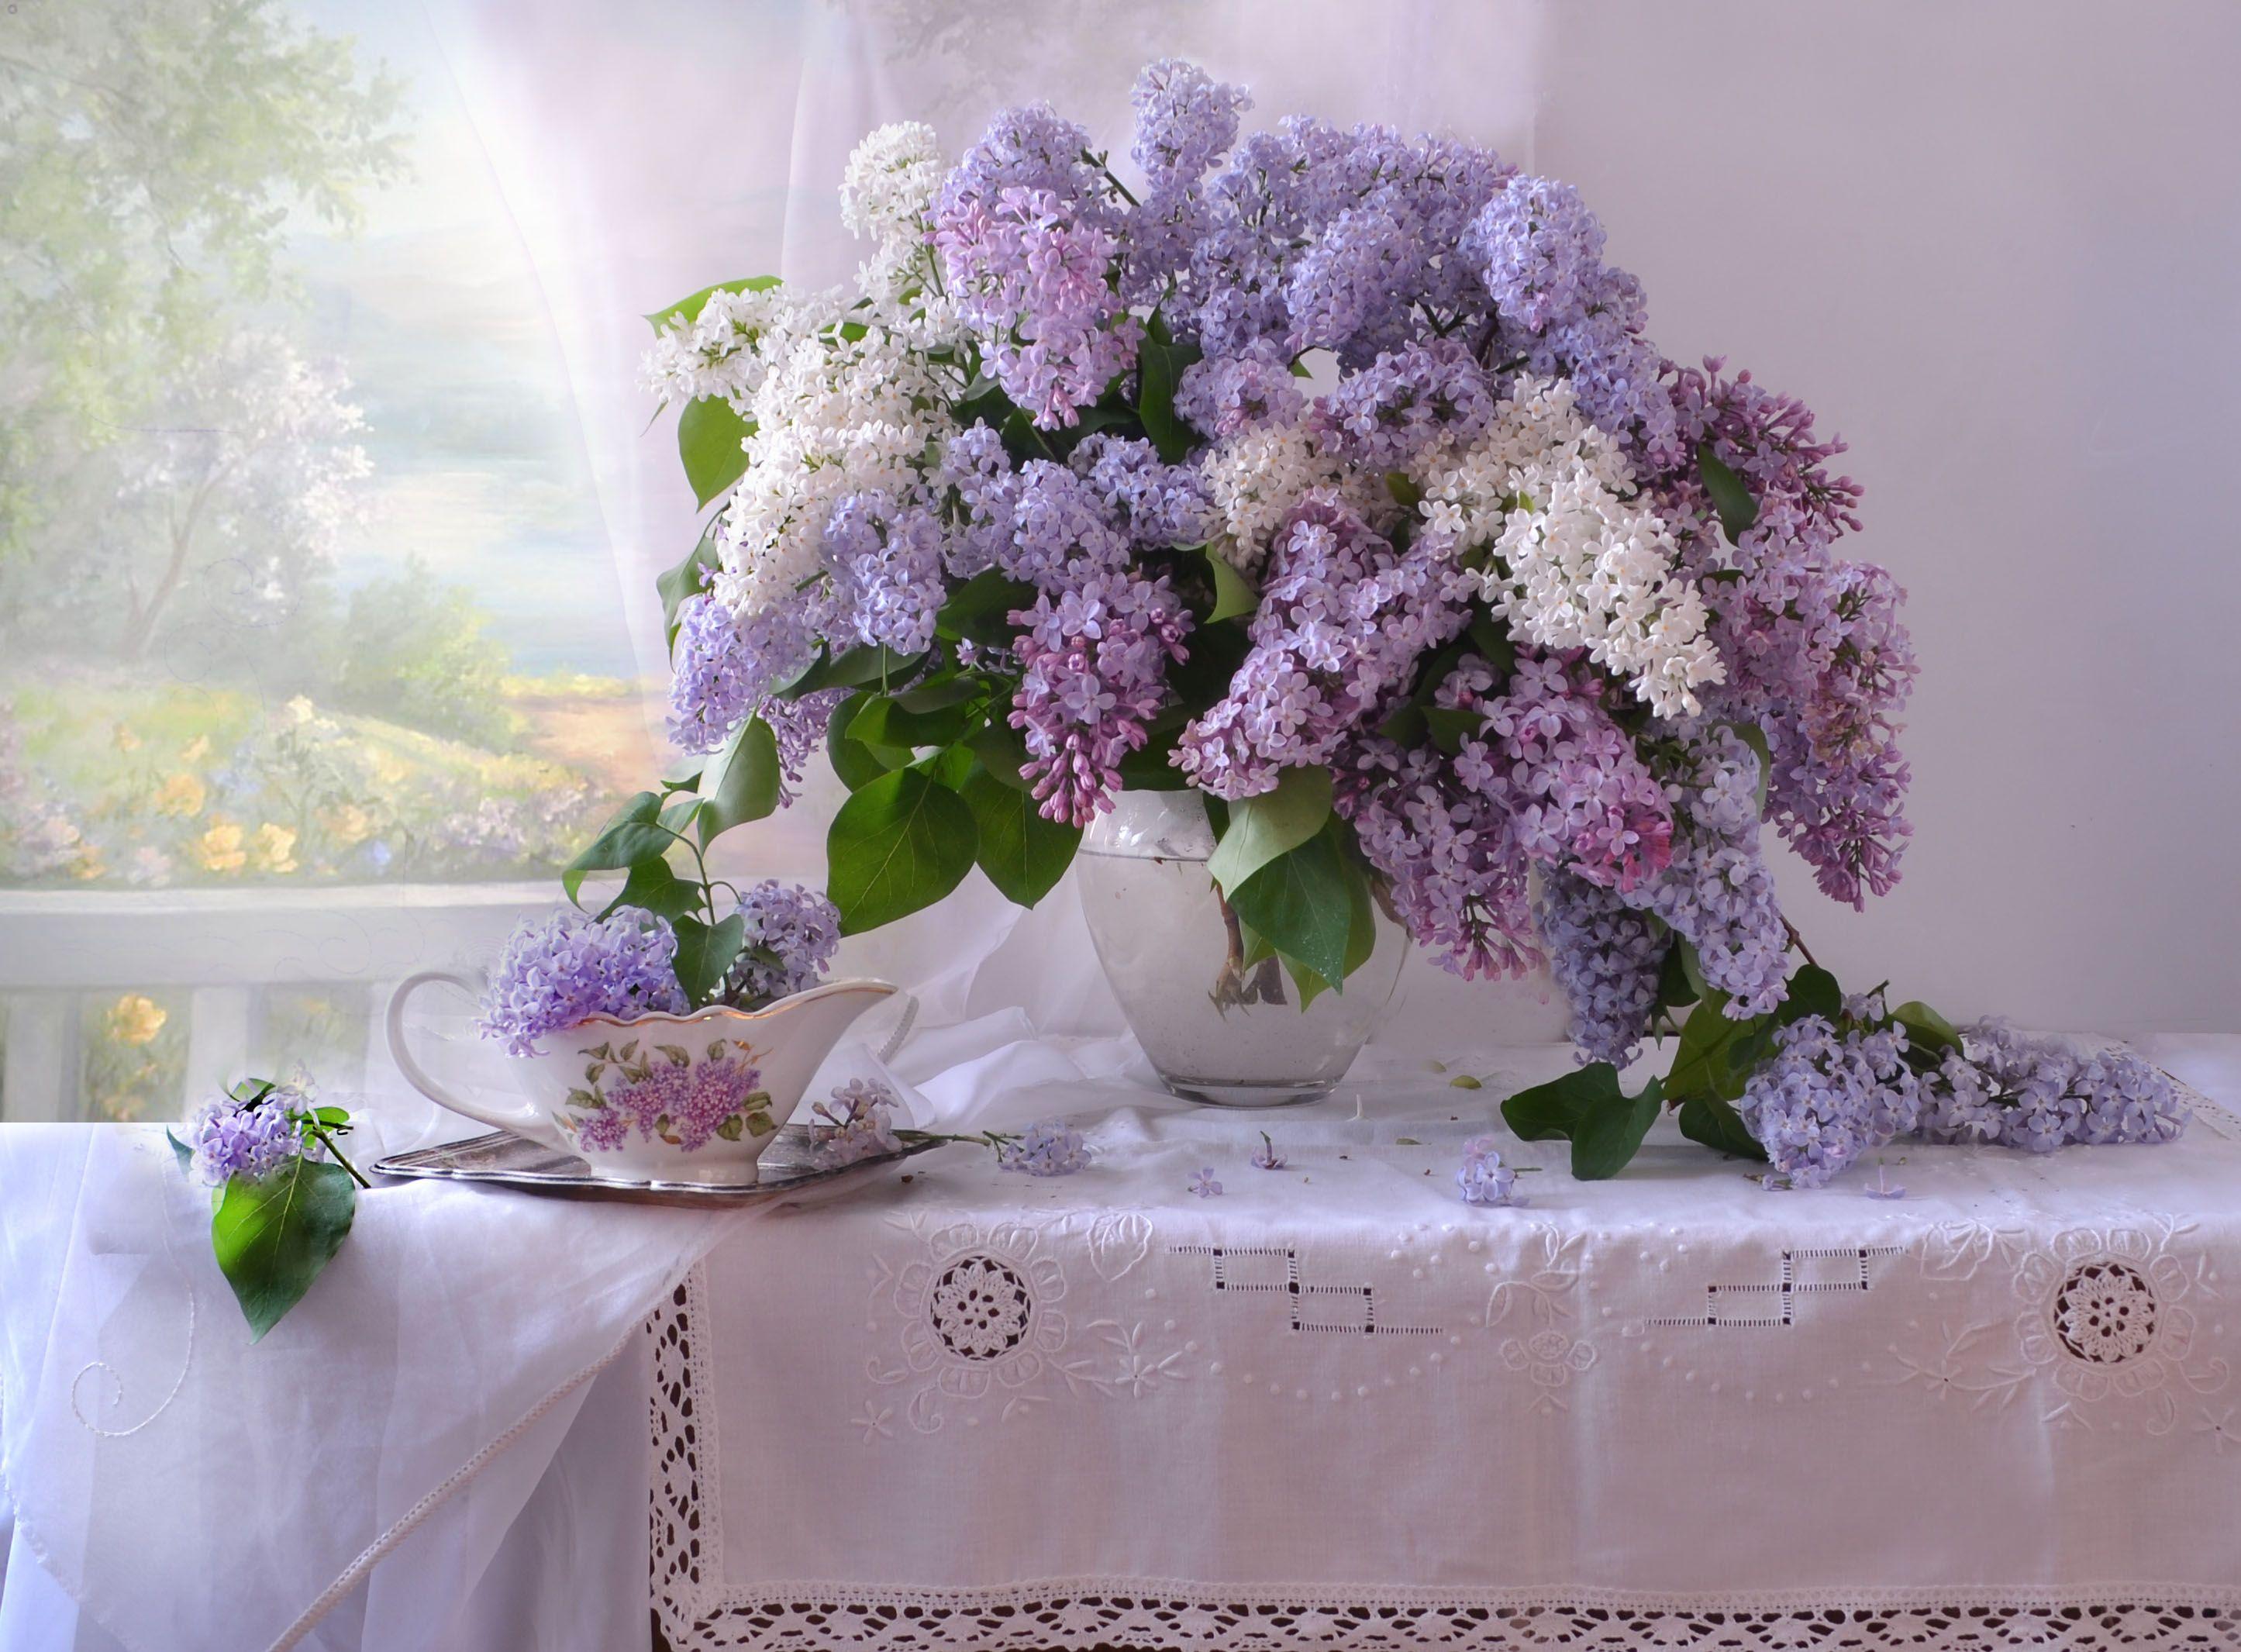 still life,натюрморт, цветы, фото натюрморт, фарфор, стекло, сирень, май, весна, Колова Валентина